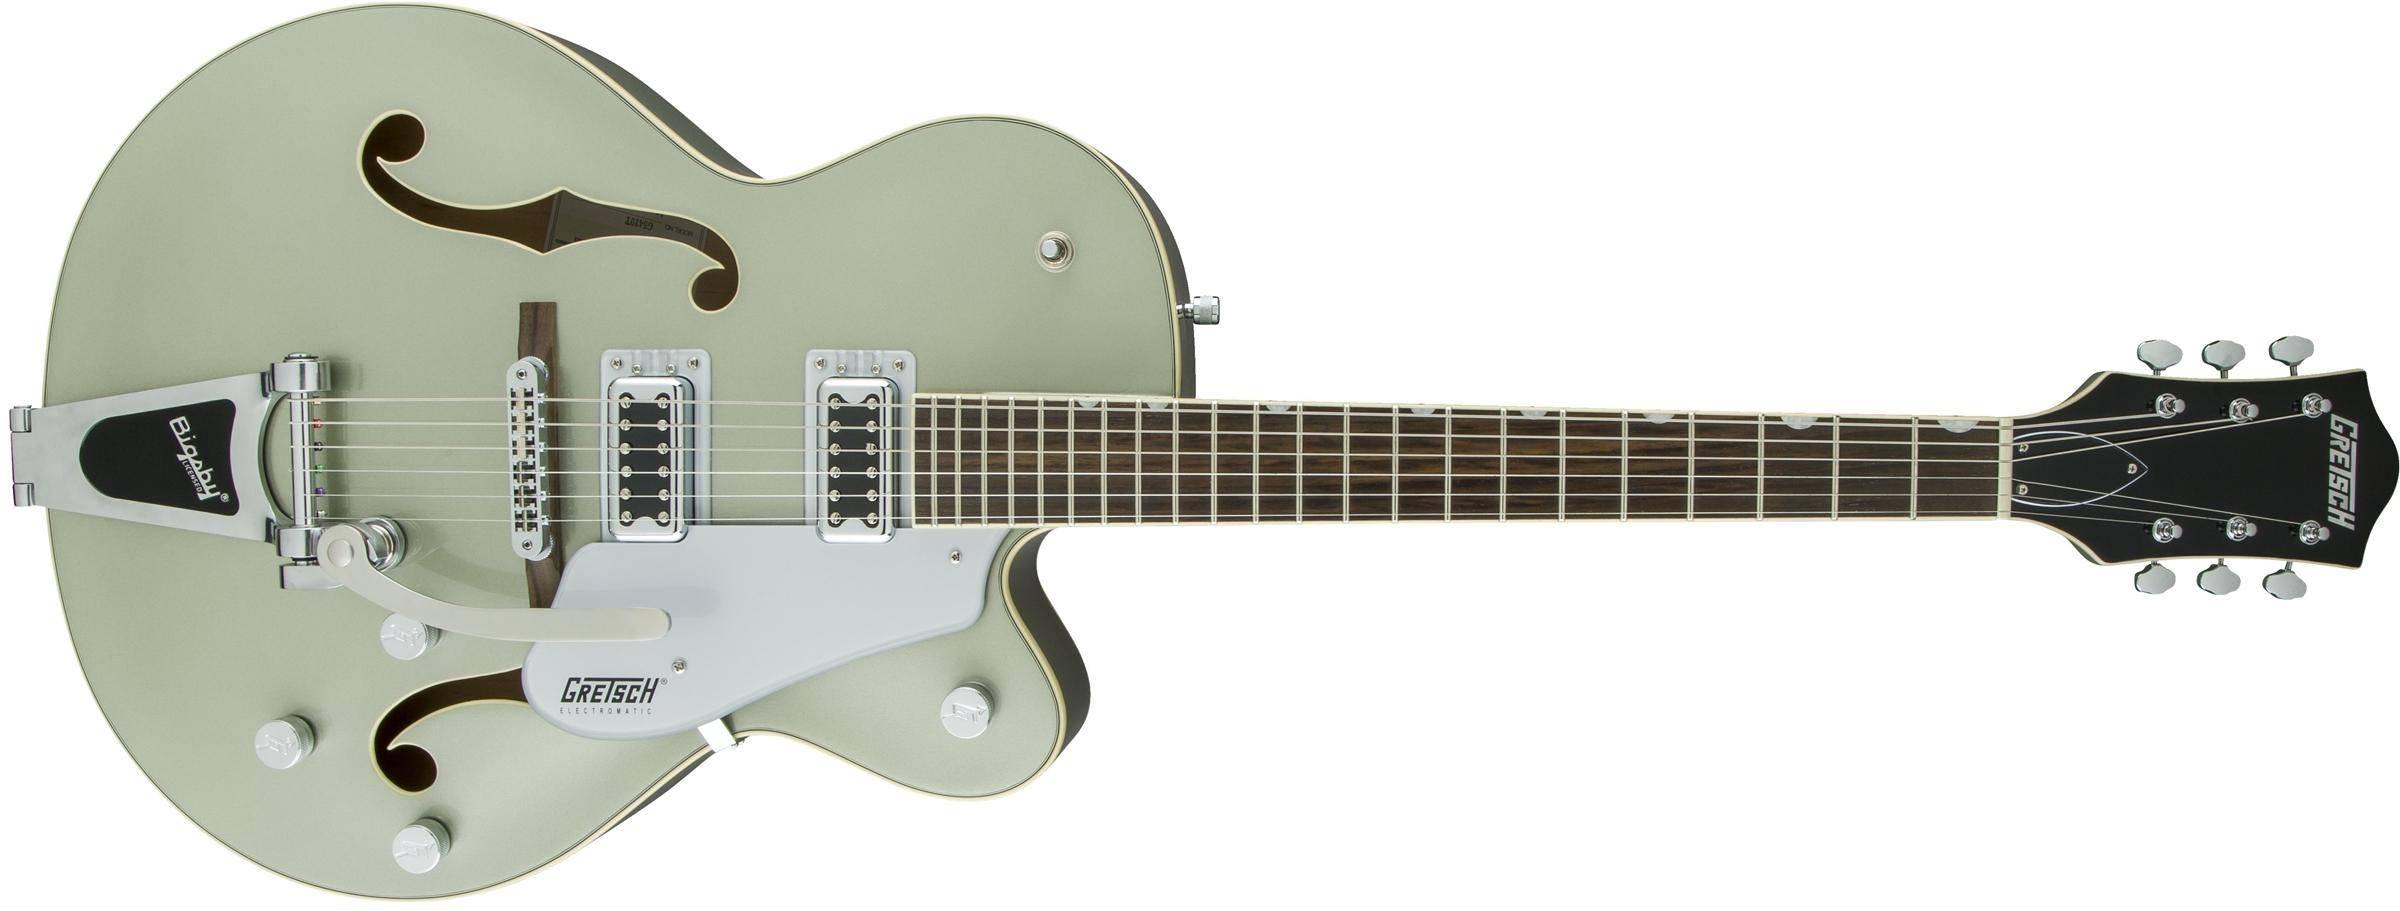 1_1_481228 gretsch guitars g5420t electromatic hollow body aspen green long